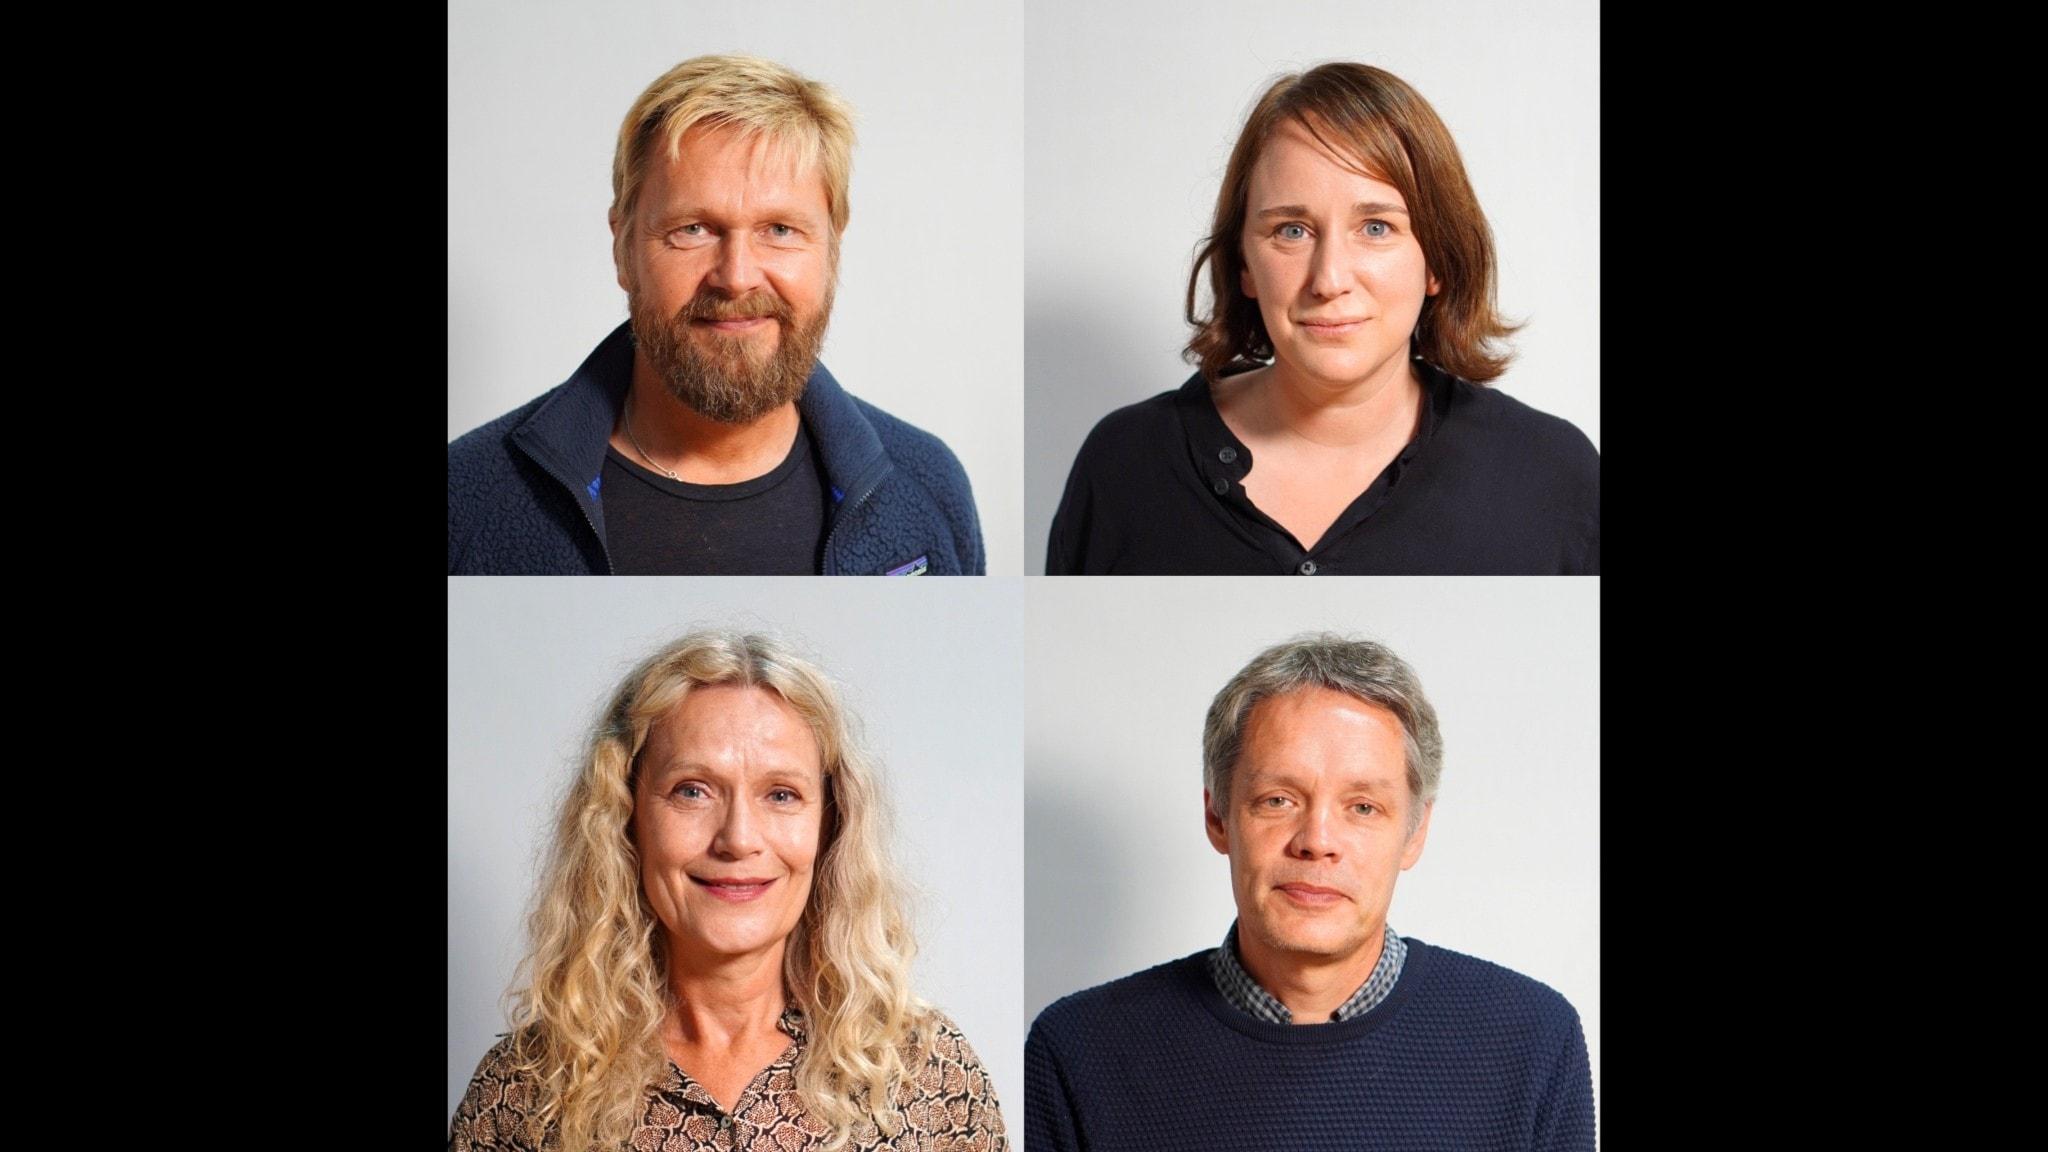 Björn Wiman & Hanna Fahl mot Åsa Wikforss & Ulf Danielsson